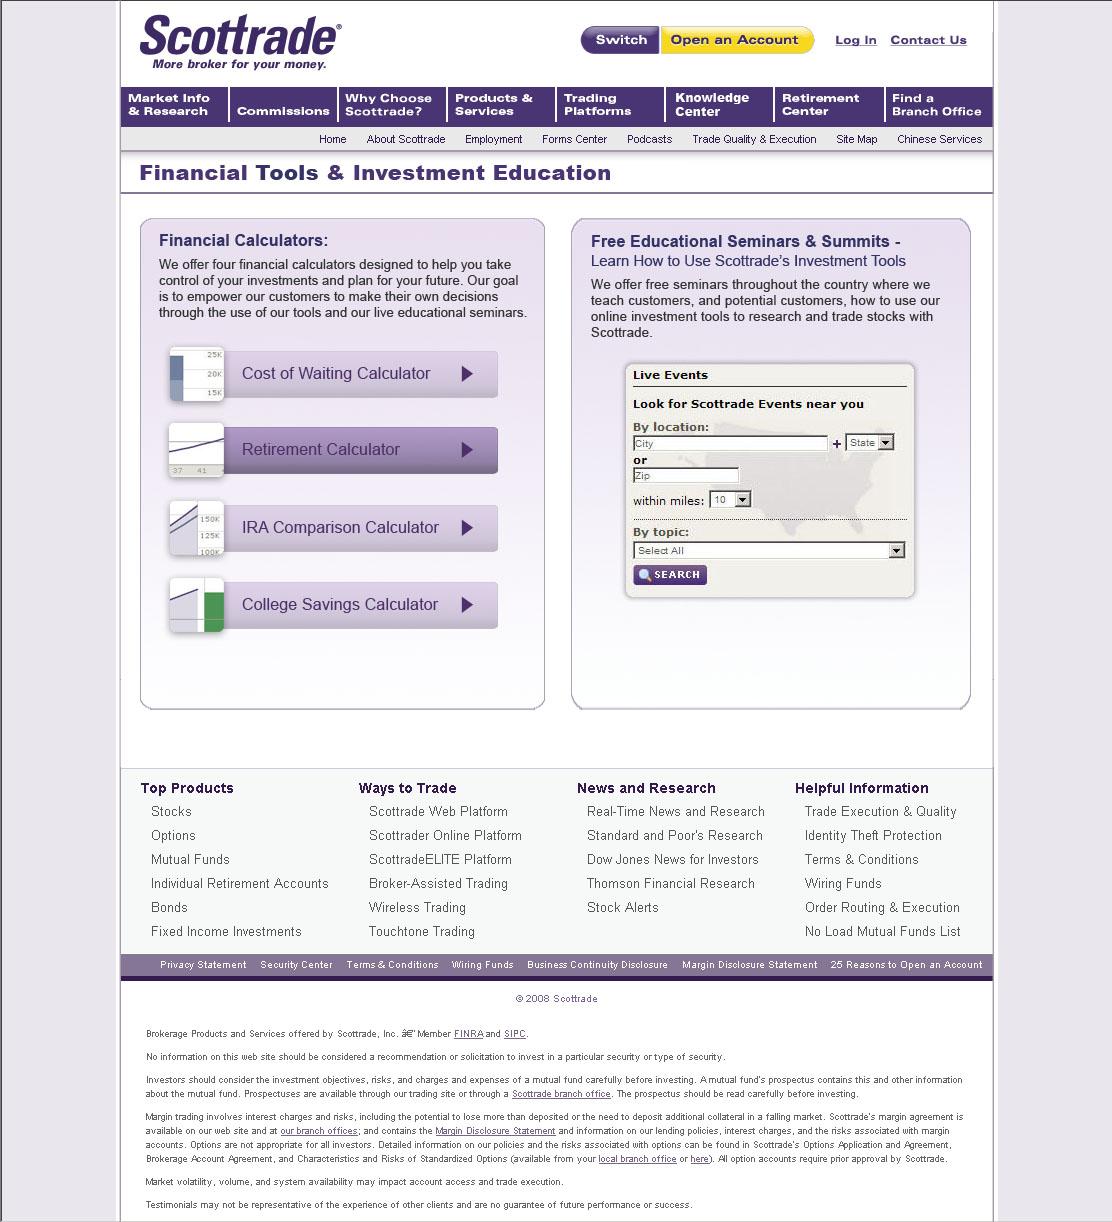 Scottrade options screener